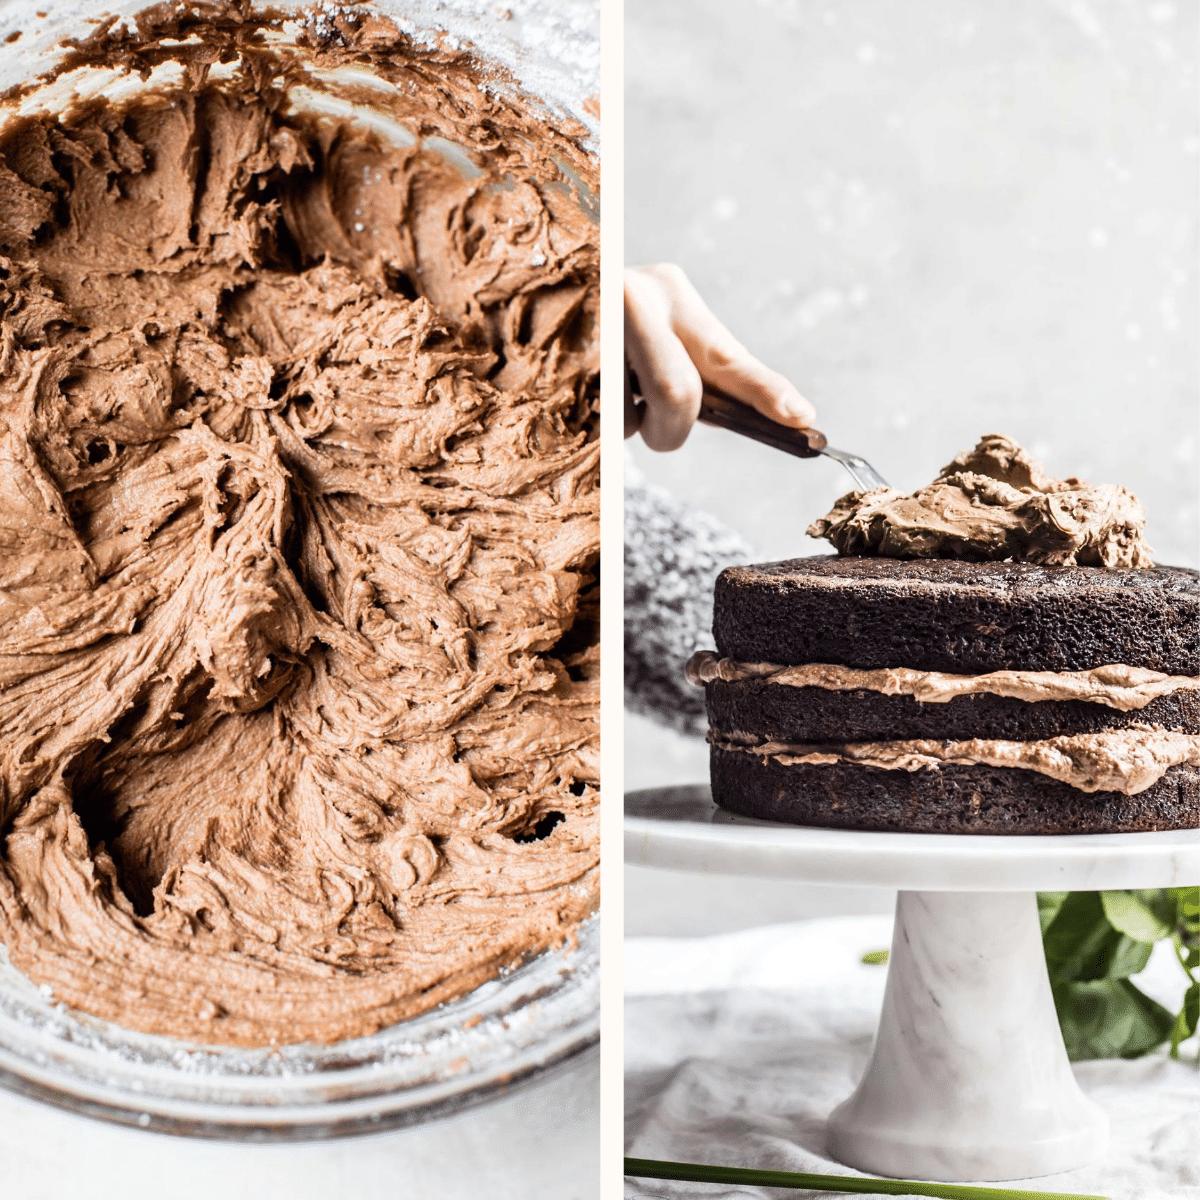 Cake and Chocolate